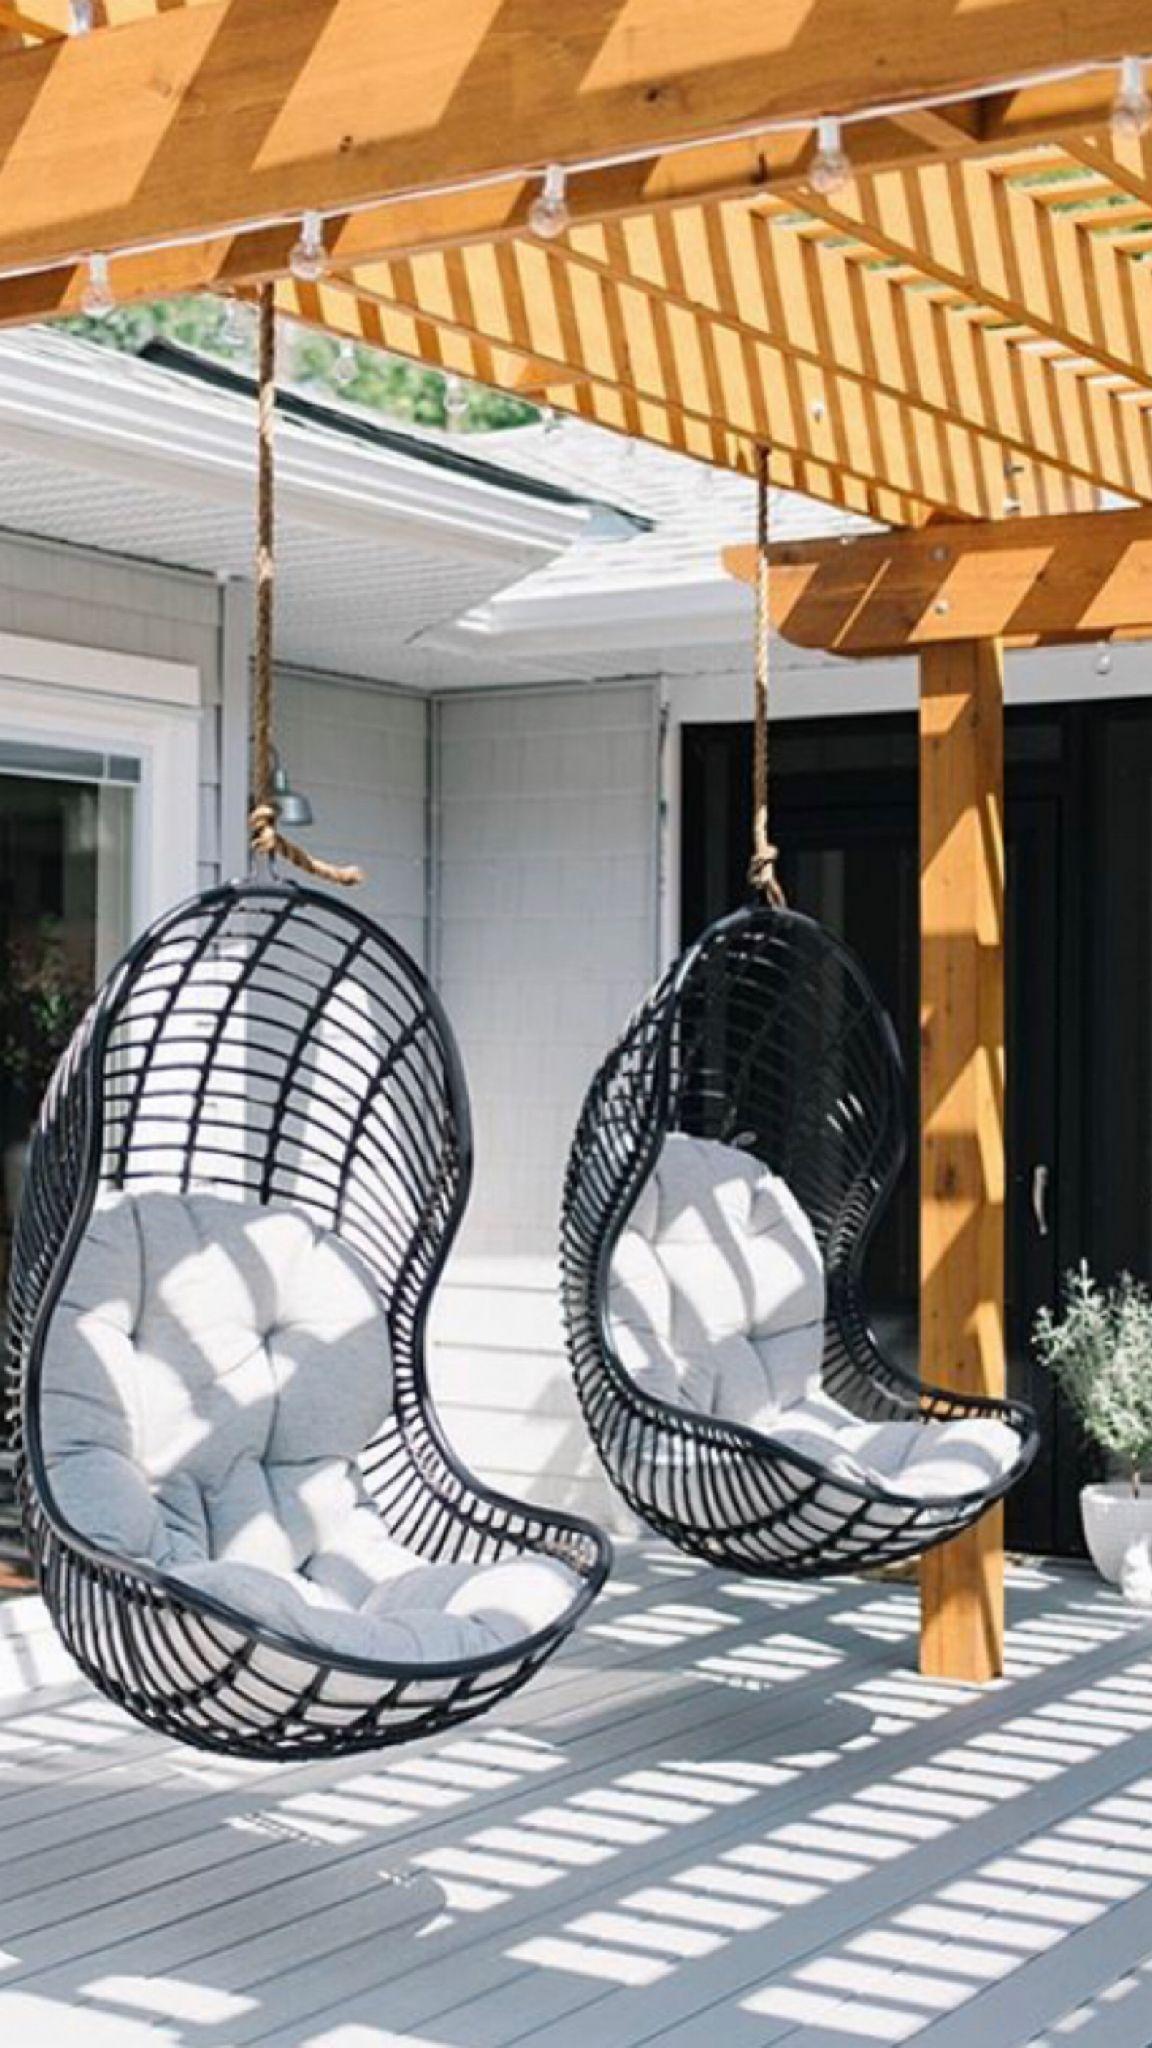 Hanging Patio Chair Cushion In 2020 Patio Swing Chair Outdoor Patio Swing Hanging Swing Chair Outdoor